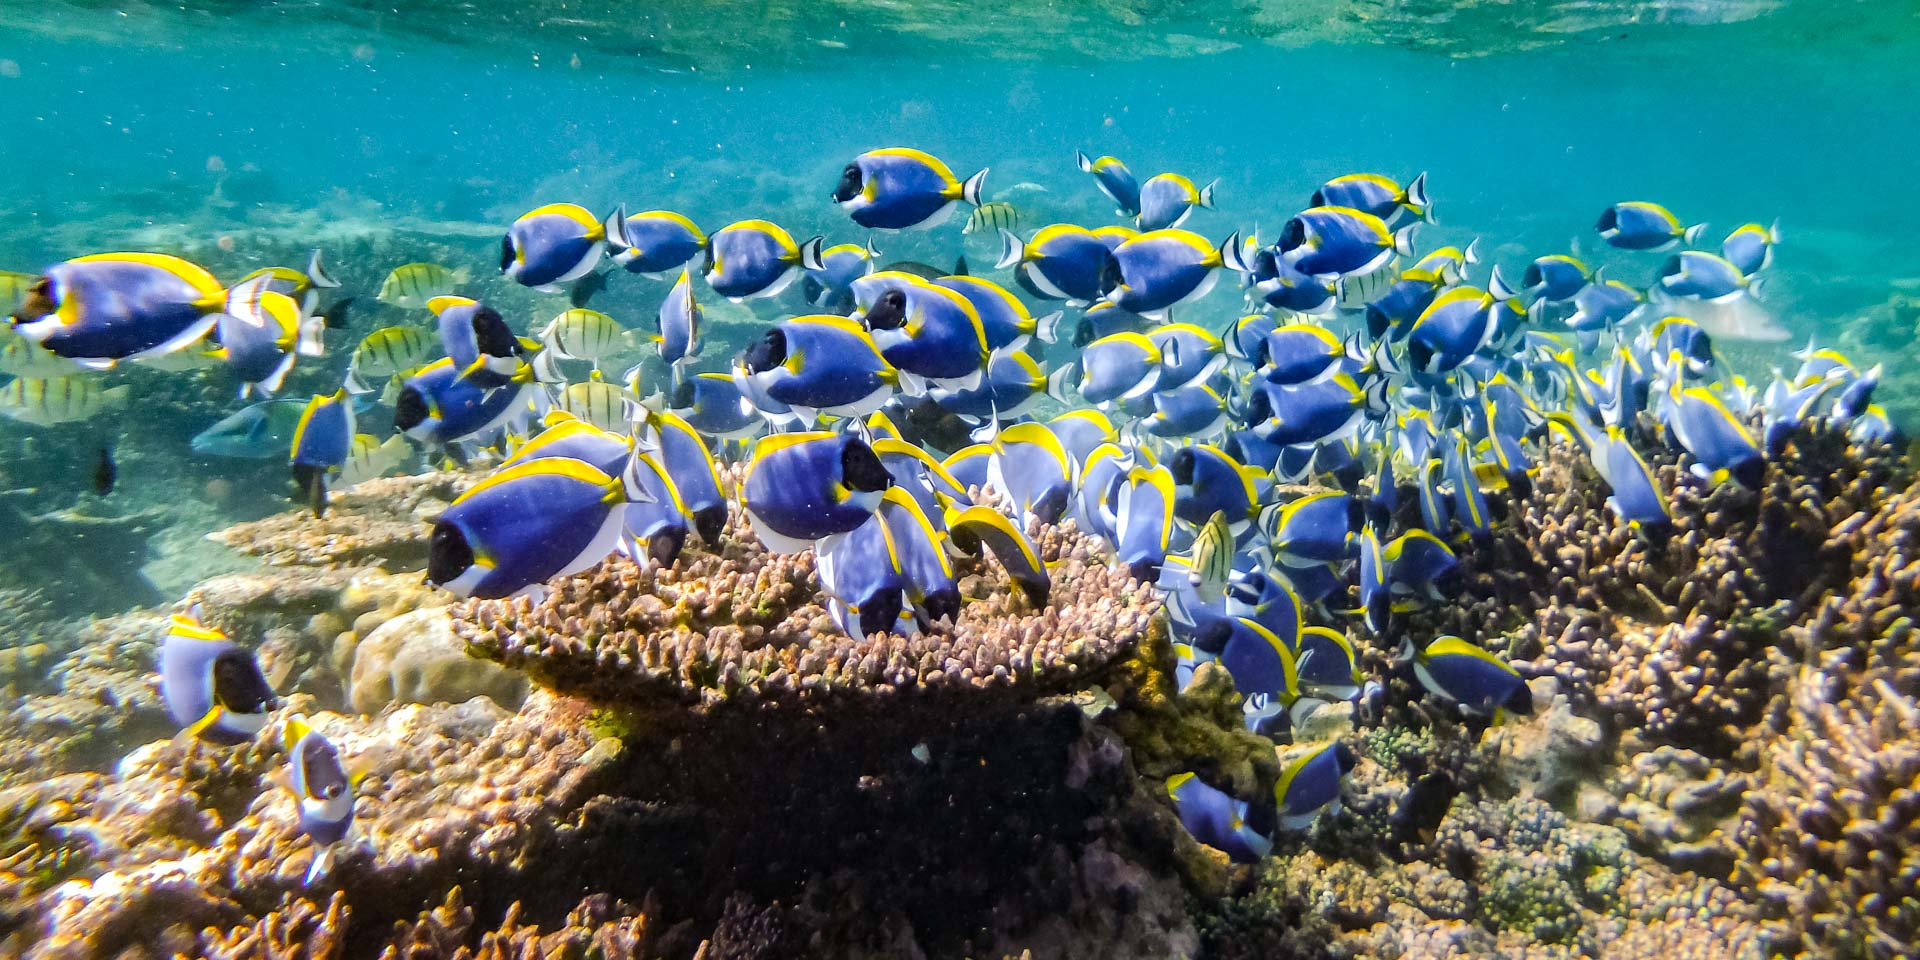 Emily ch2 – marine biology intern, Seamarc Maldives (4) coral reef 1920